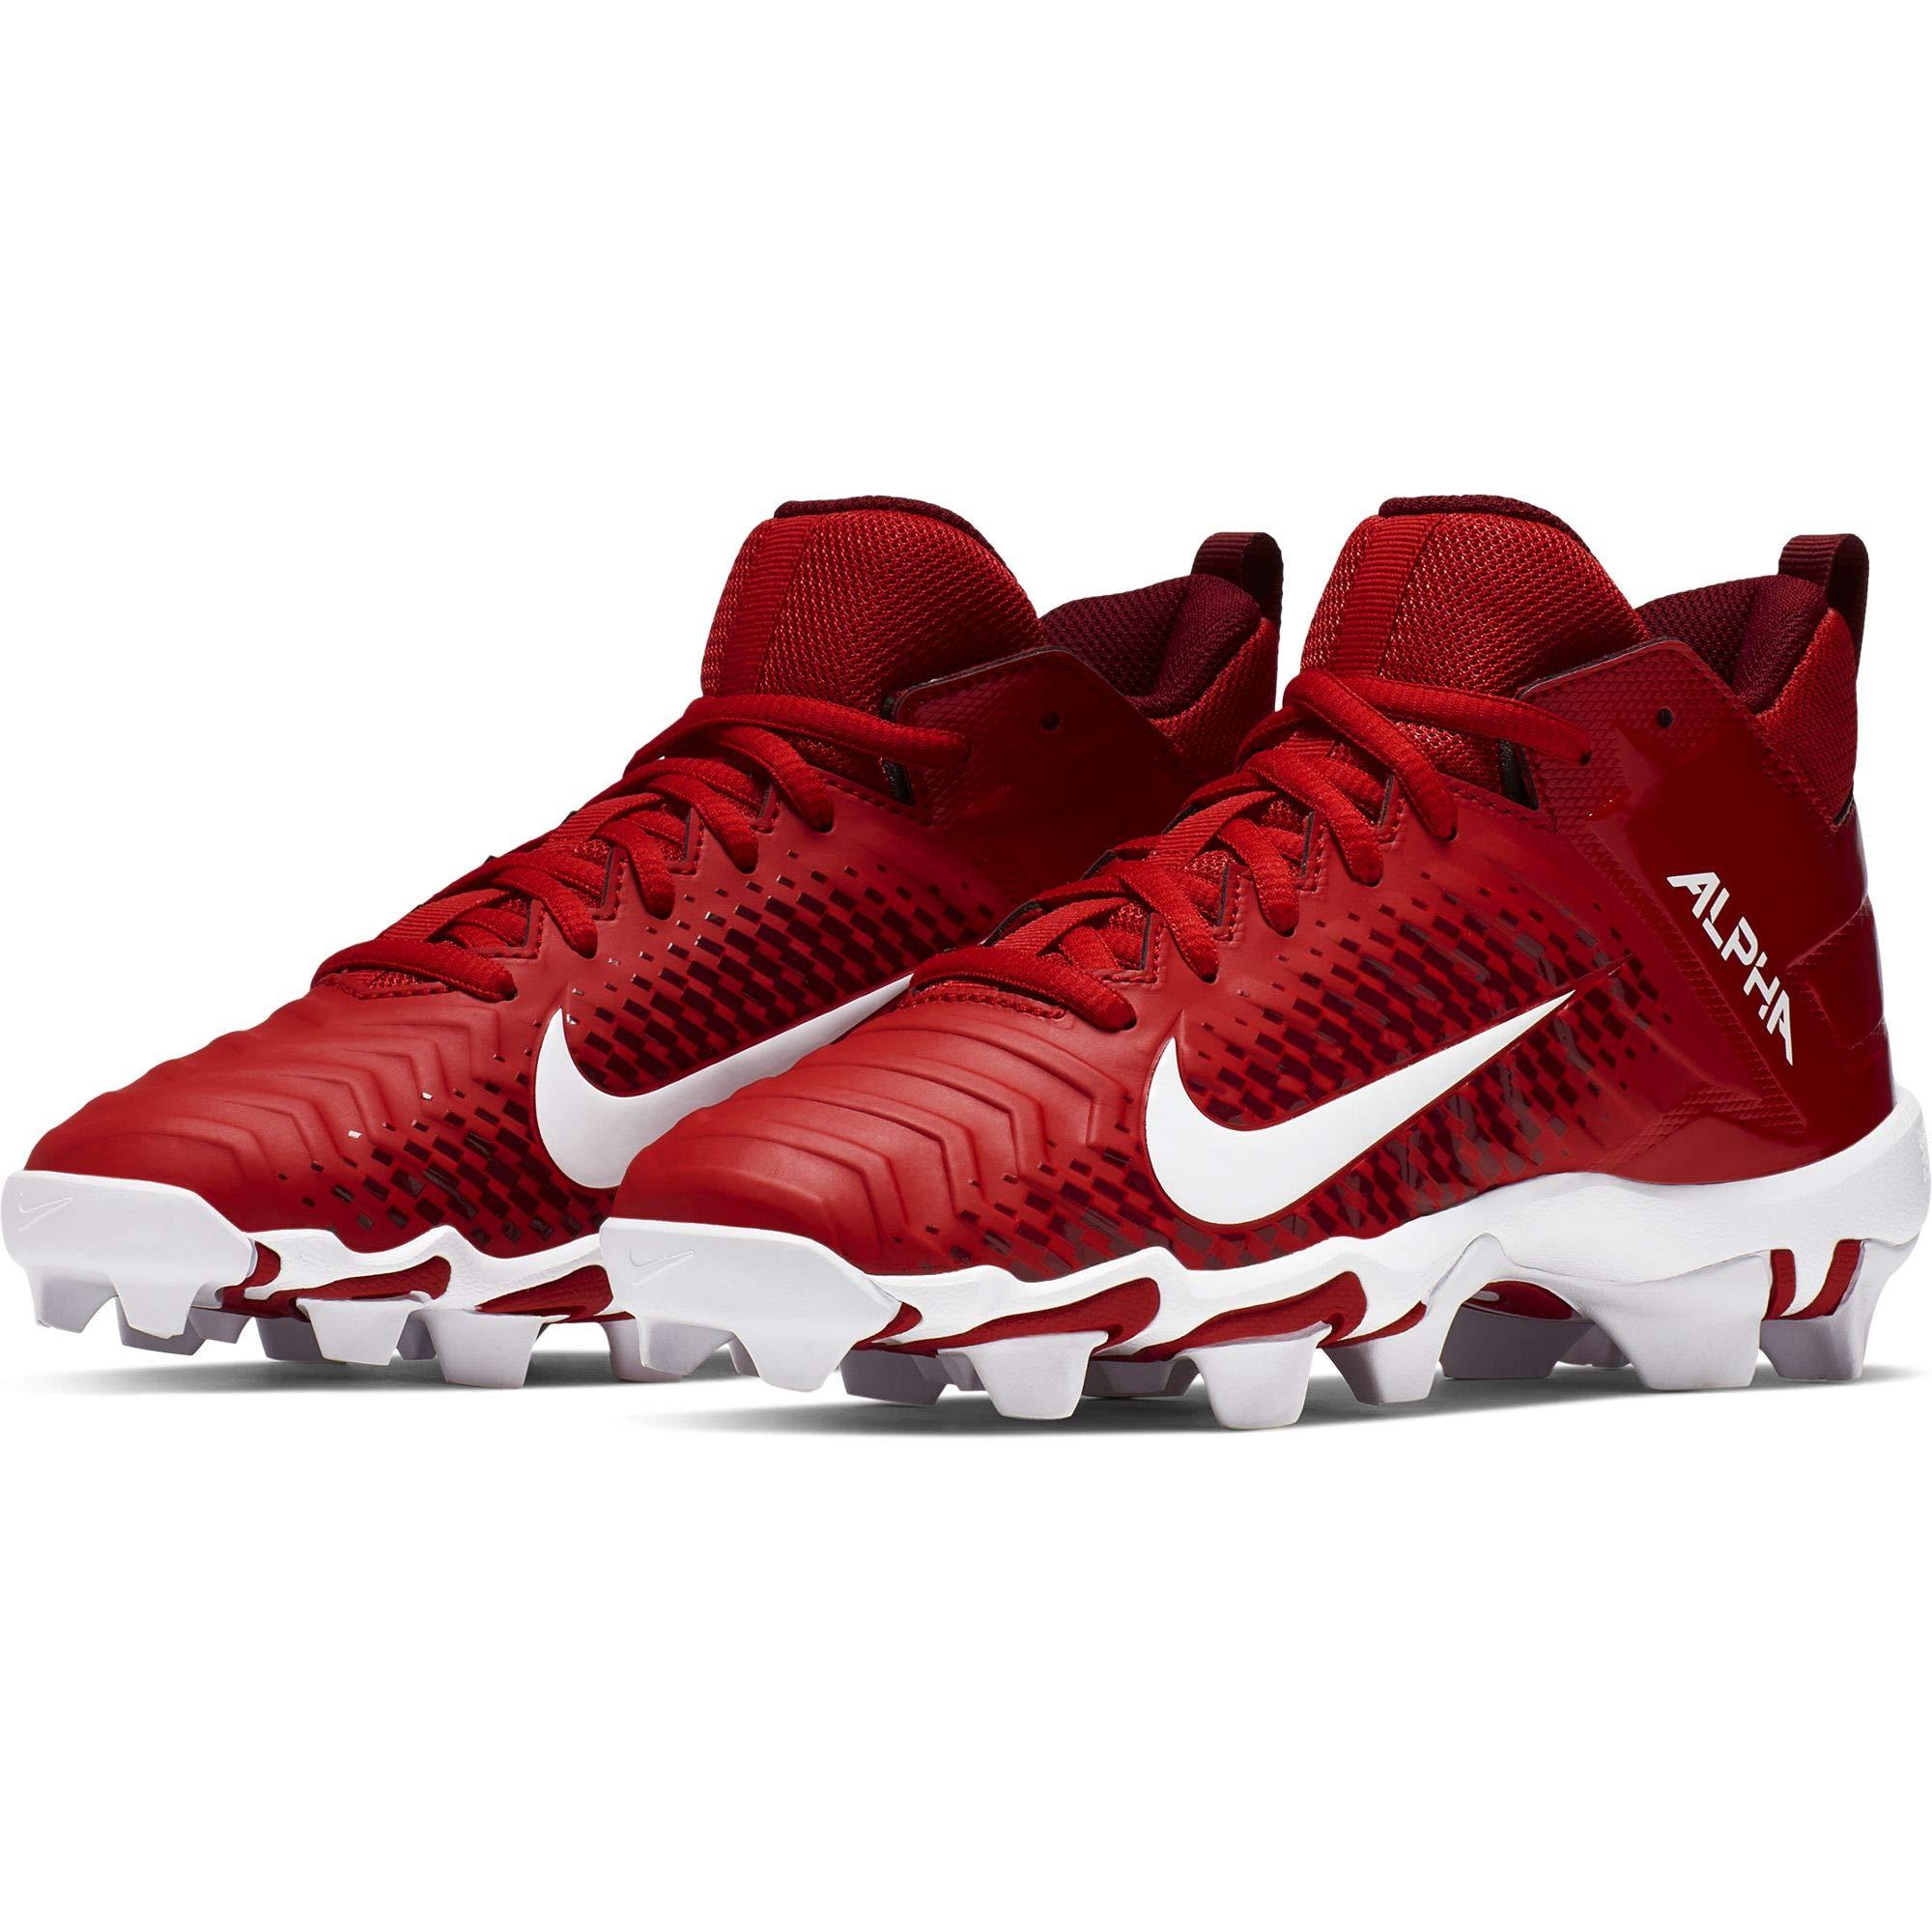 Nike Boy's Alpha Menace Shark 2 Football Cleat University Red/White Size 12 Kids US